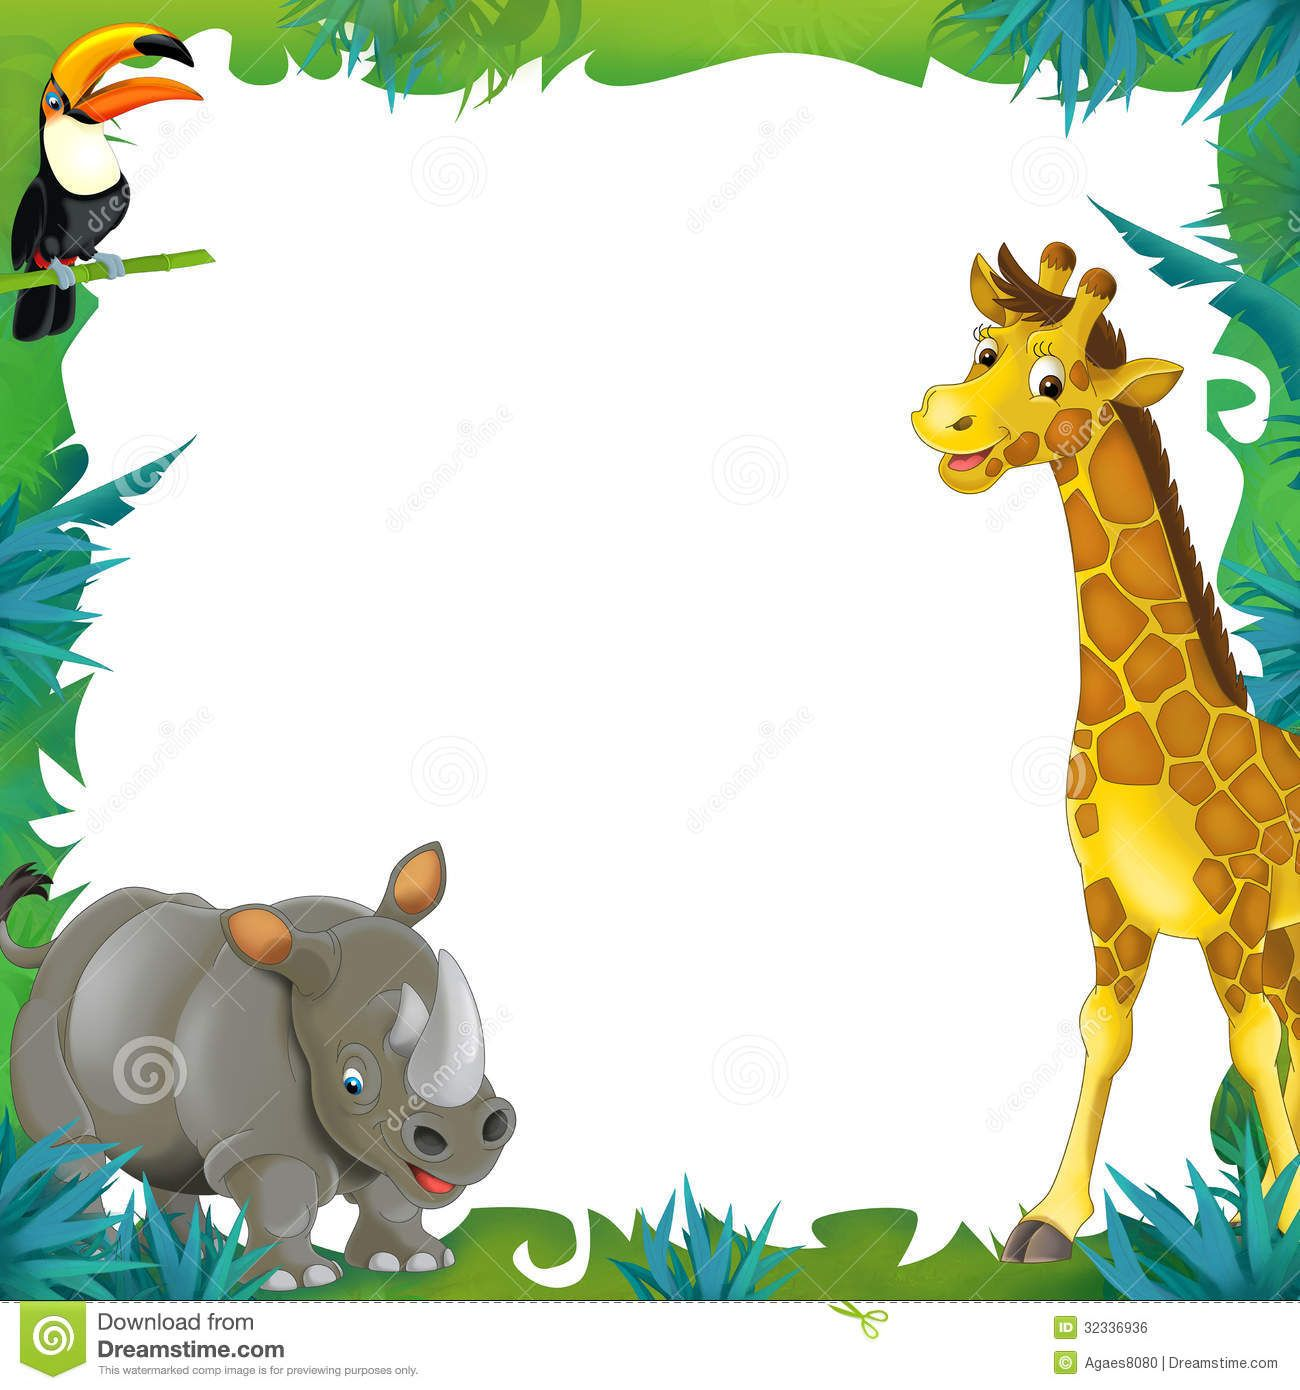 Cartoon safari frame border. Jungle clipart powerpoint